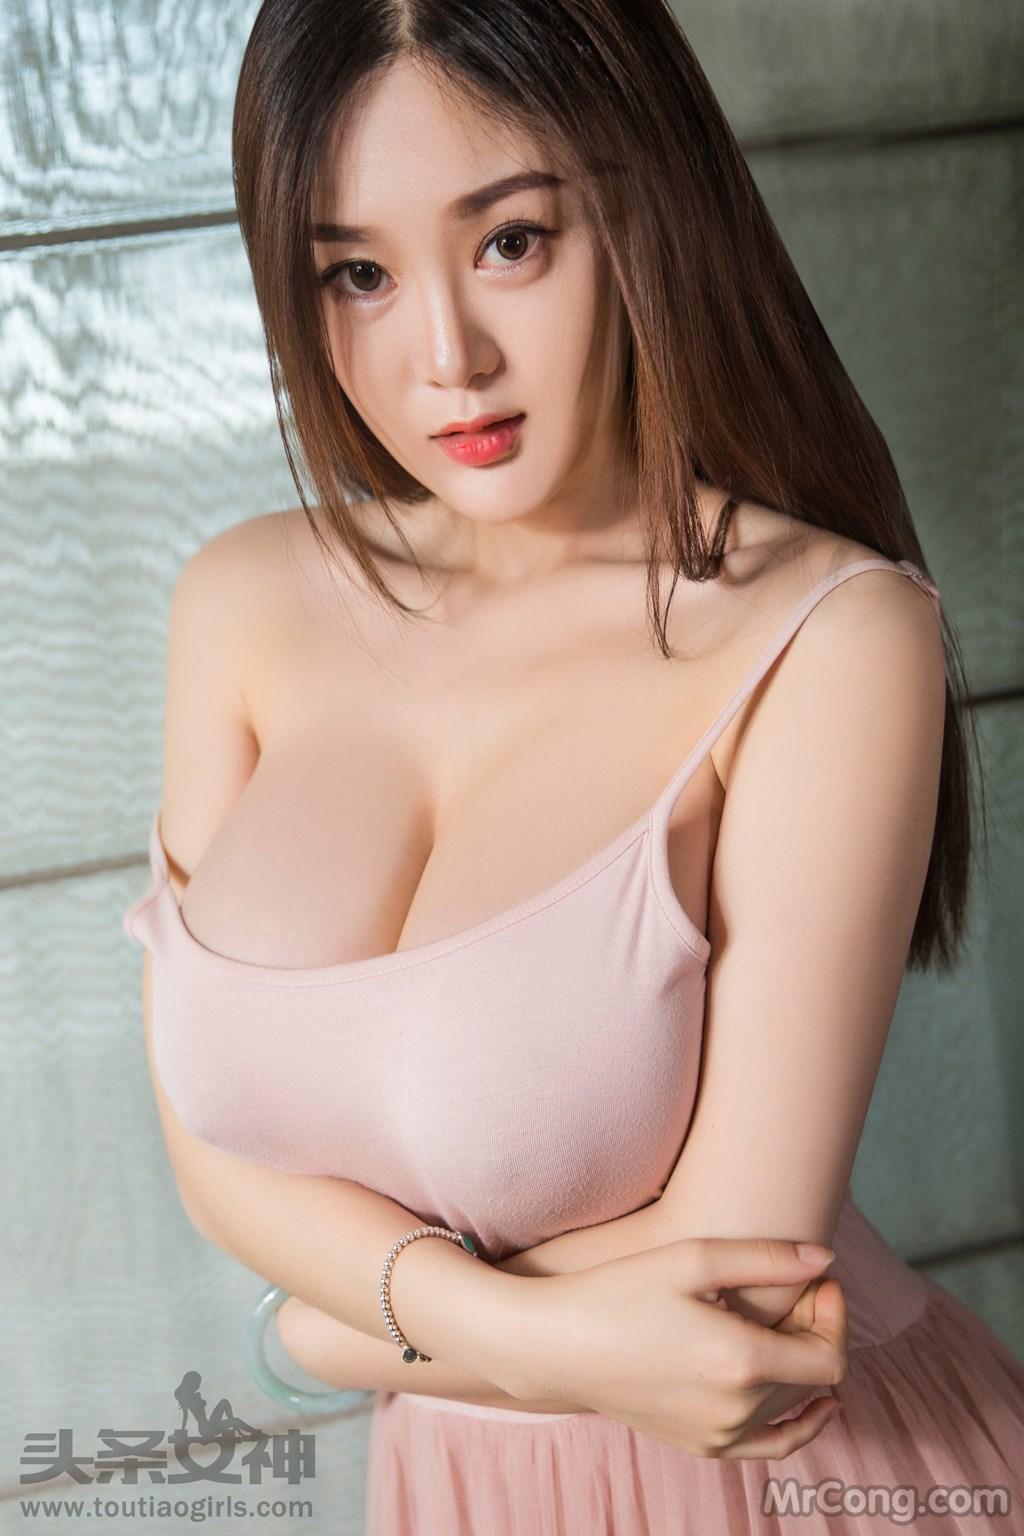 Toutiao 2017-05-08 Ngi Mu Yi Yang  30 Nh - Page -3047